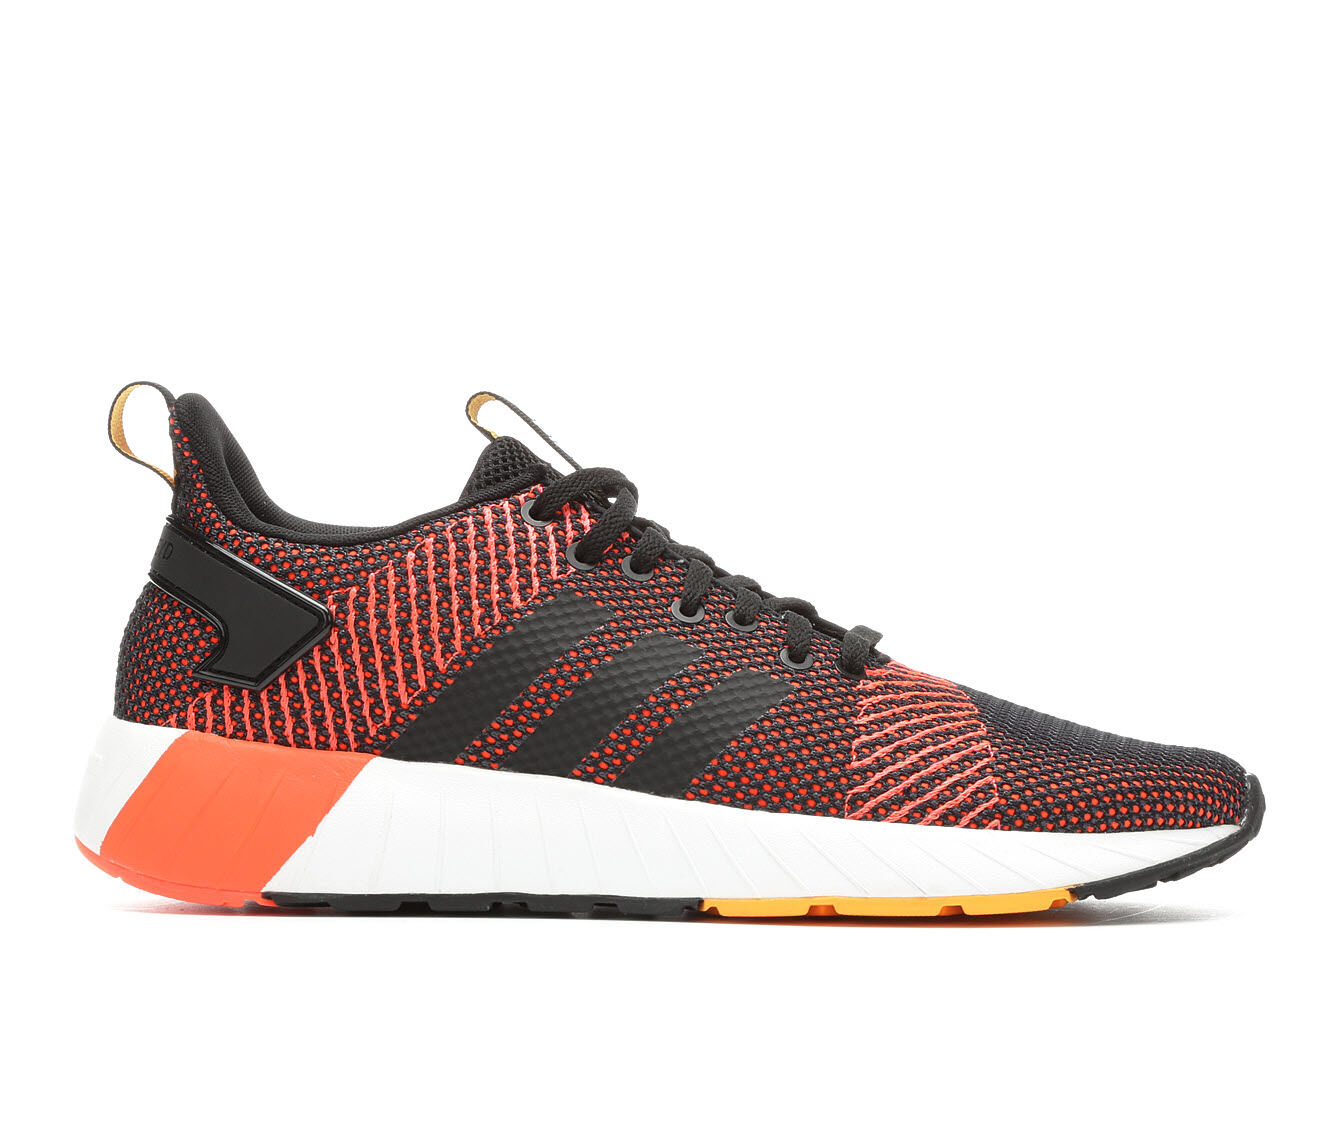 adidas Questar Byd Sneaker oIPjj9